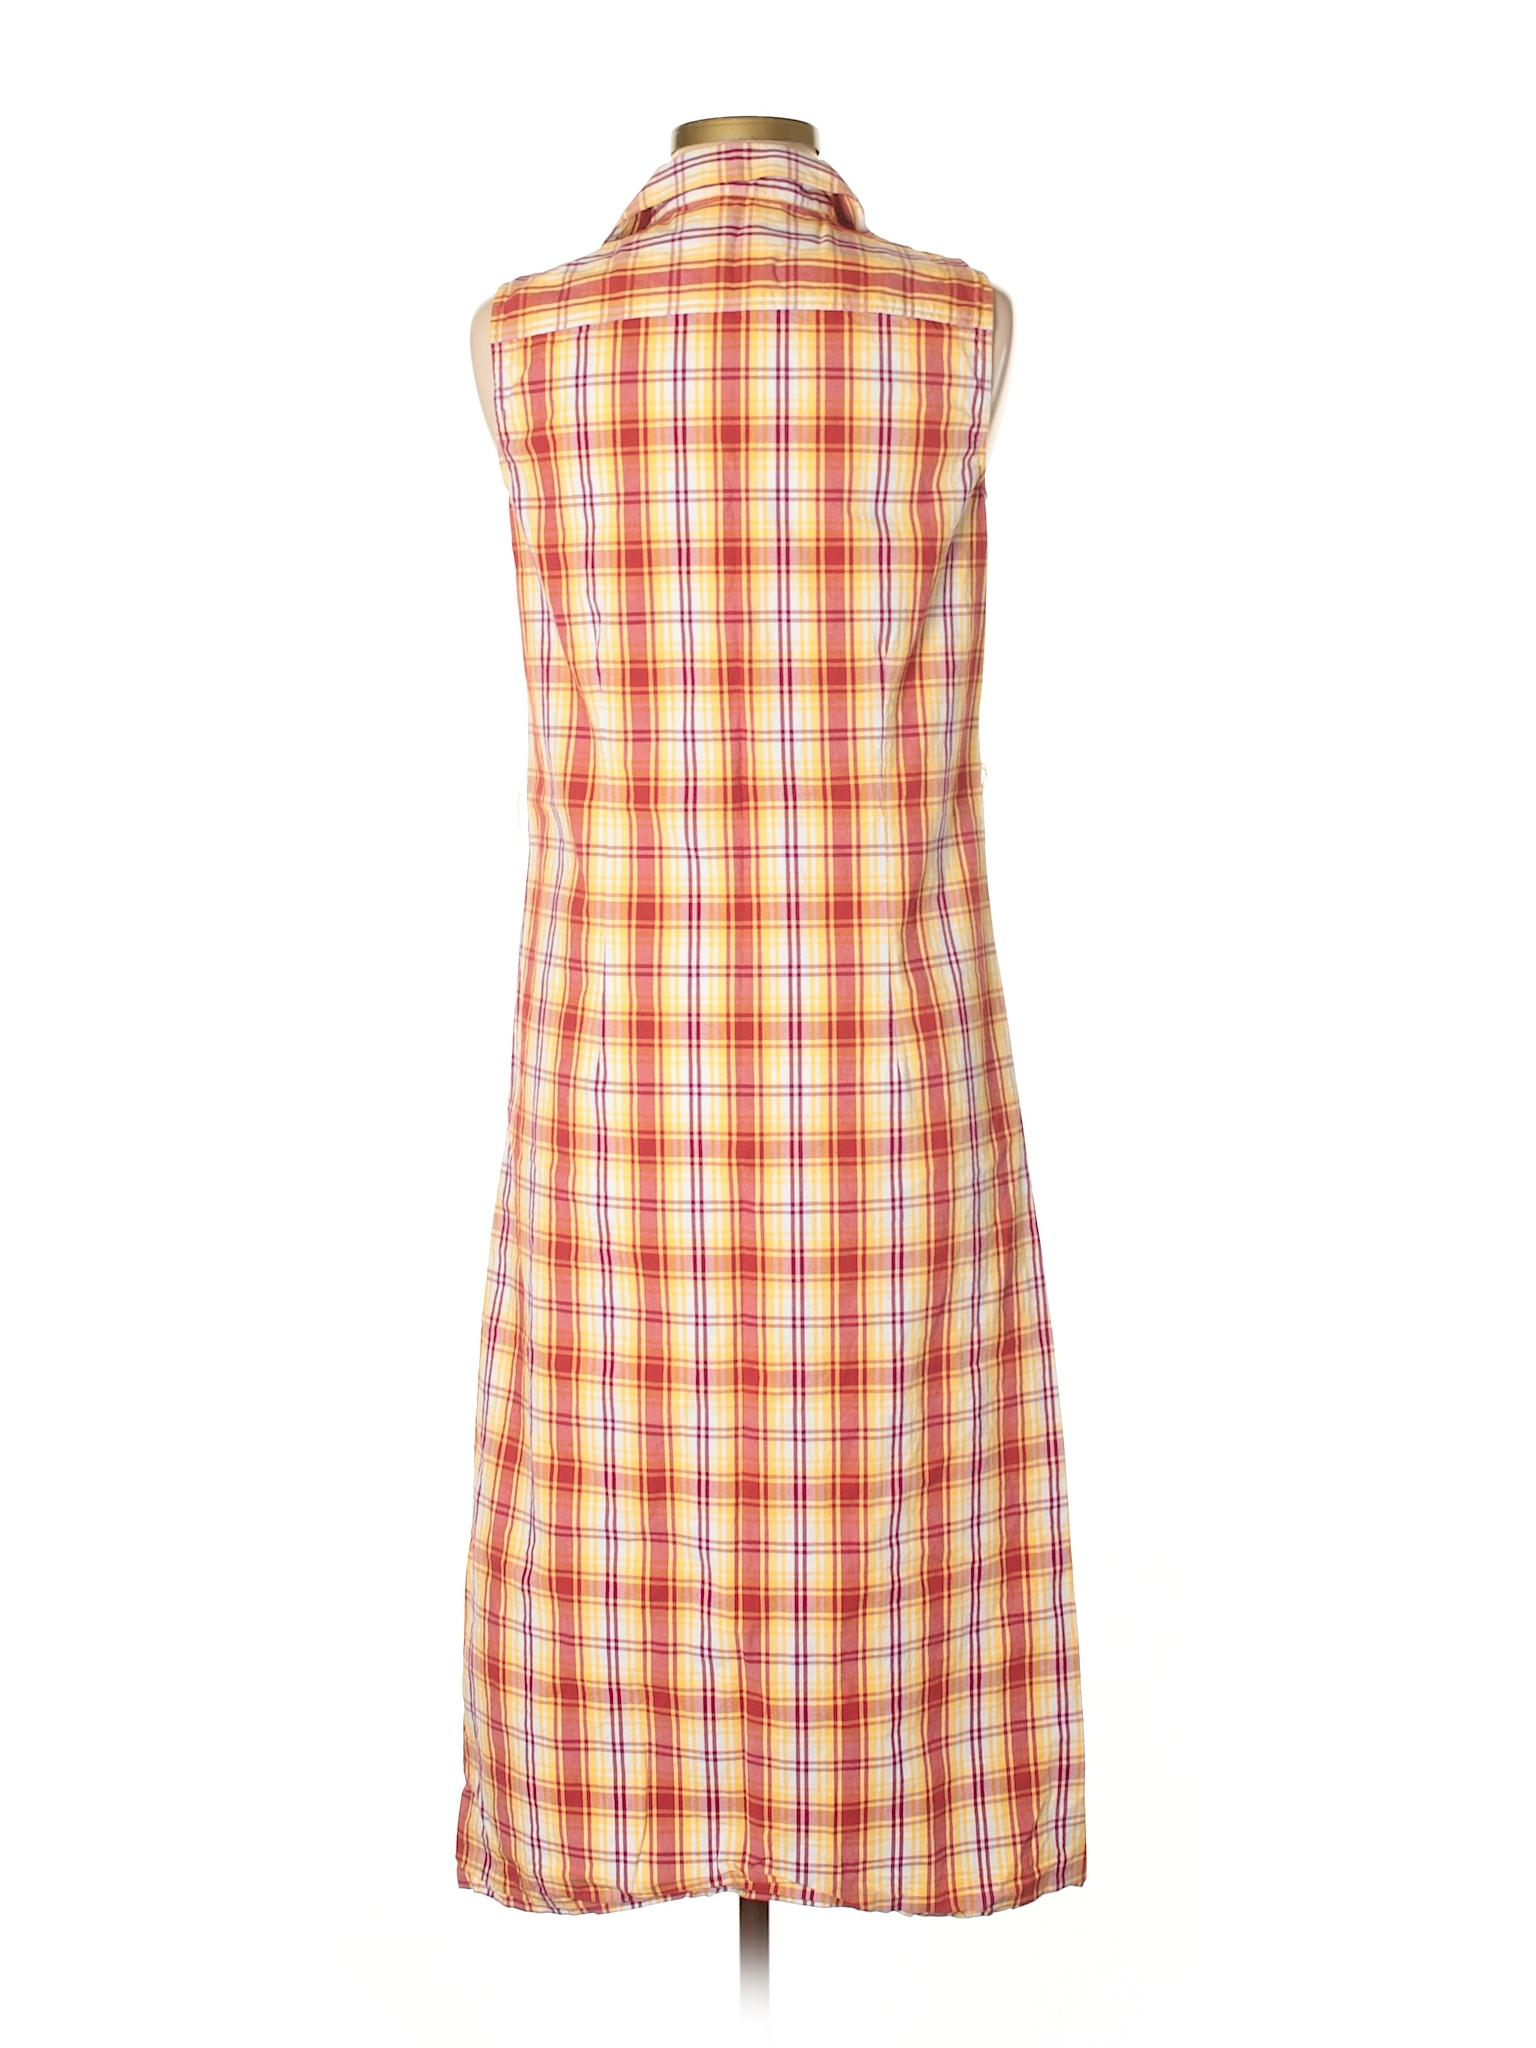 Dress Croft amp; Selling Barrow Casual qxf8Iw4Sw